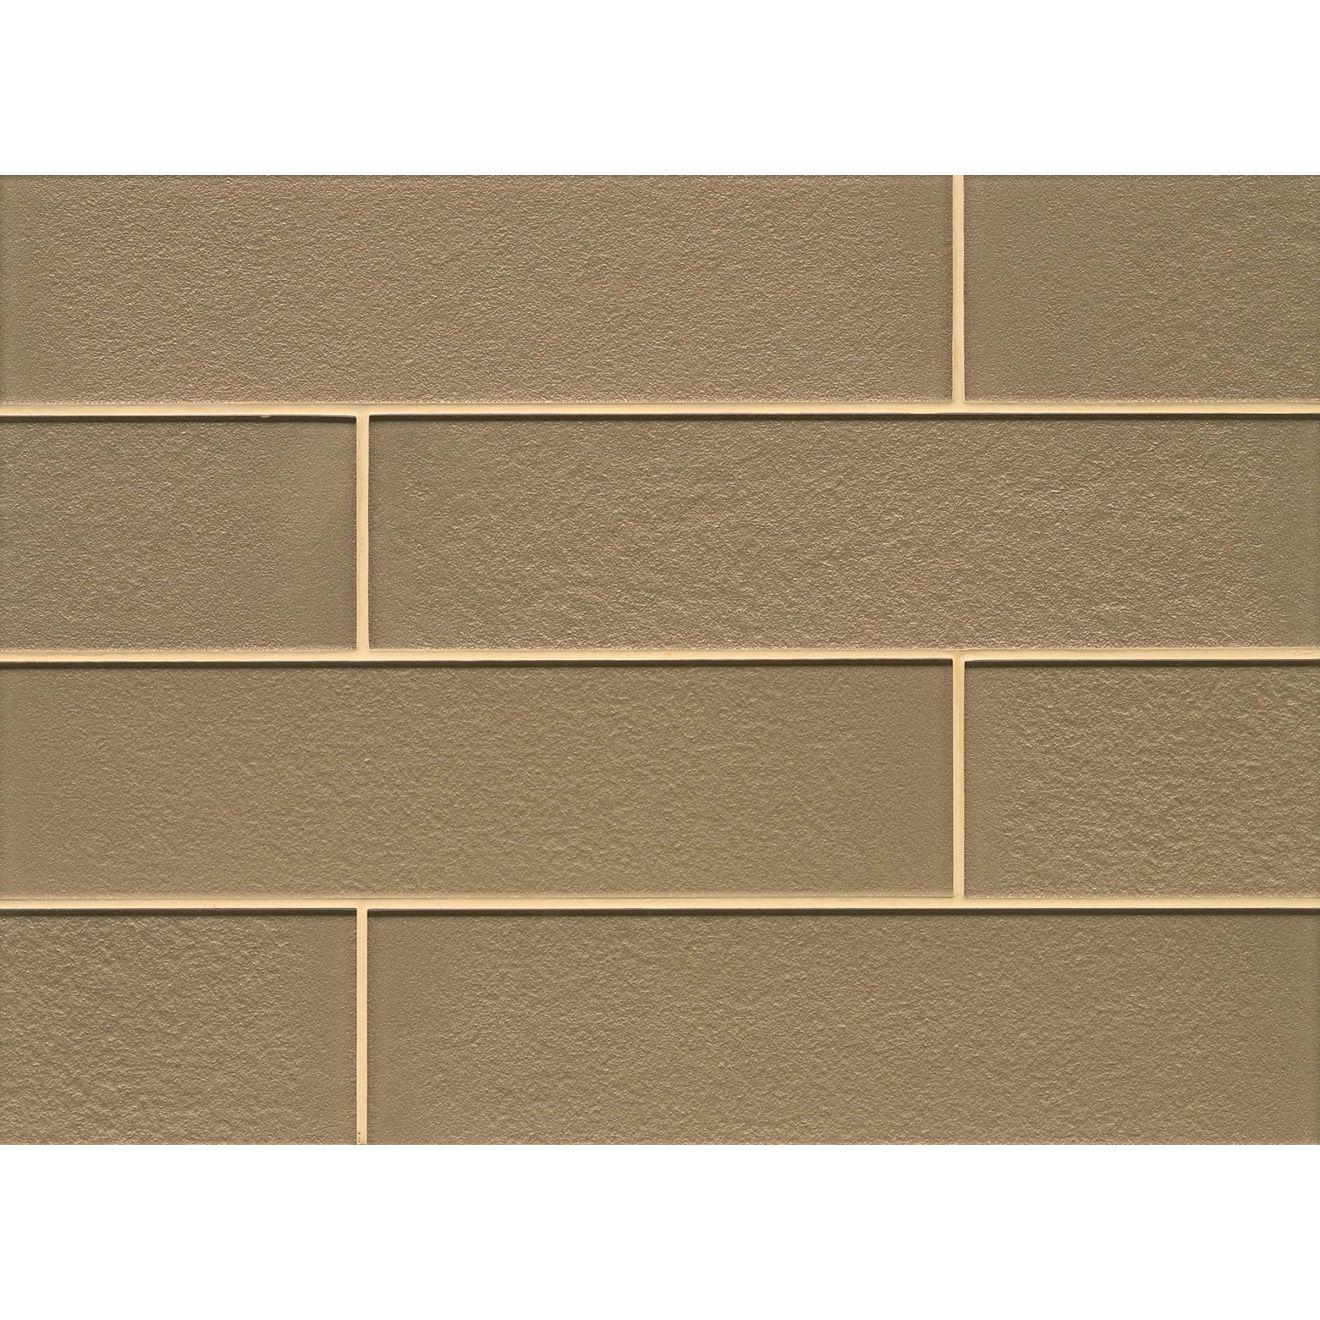 "Manhattan 4"" x 16"" Wall Tile in Heiress"